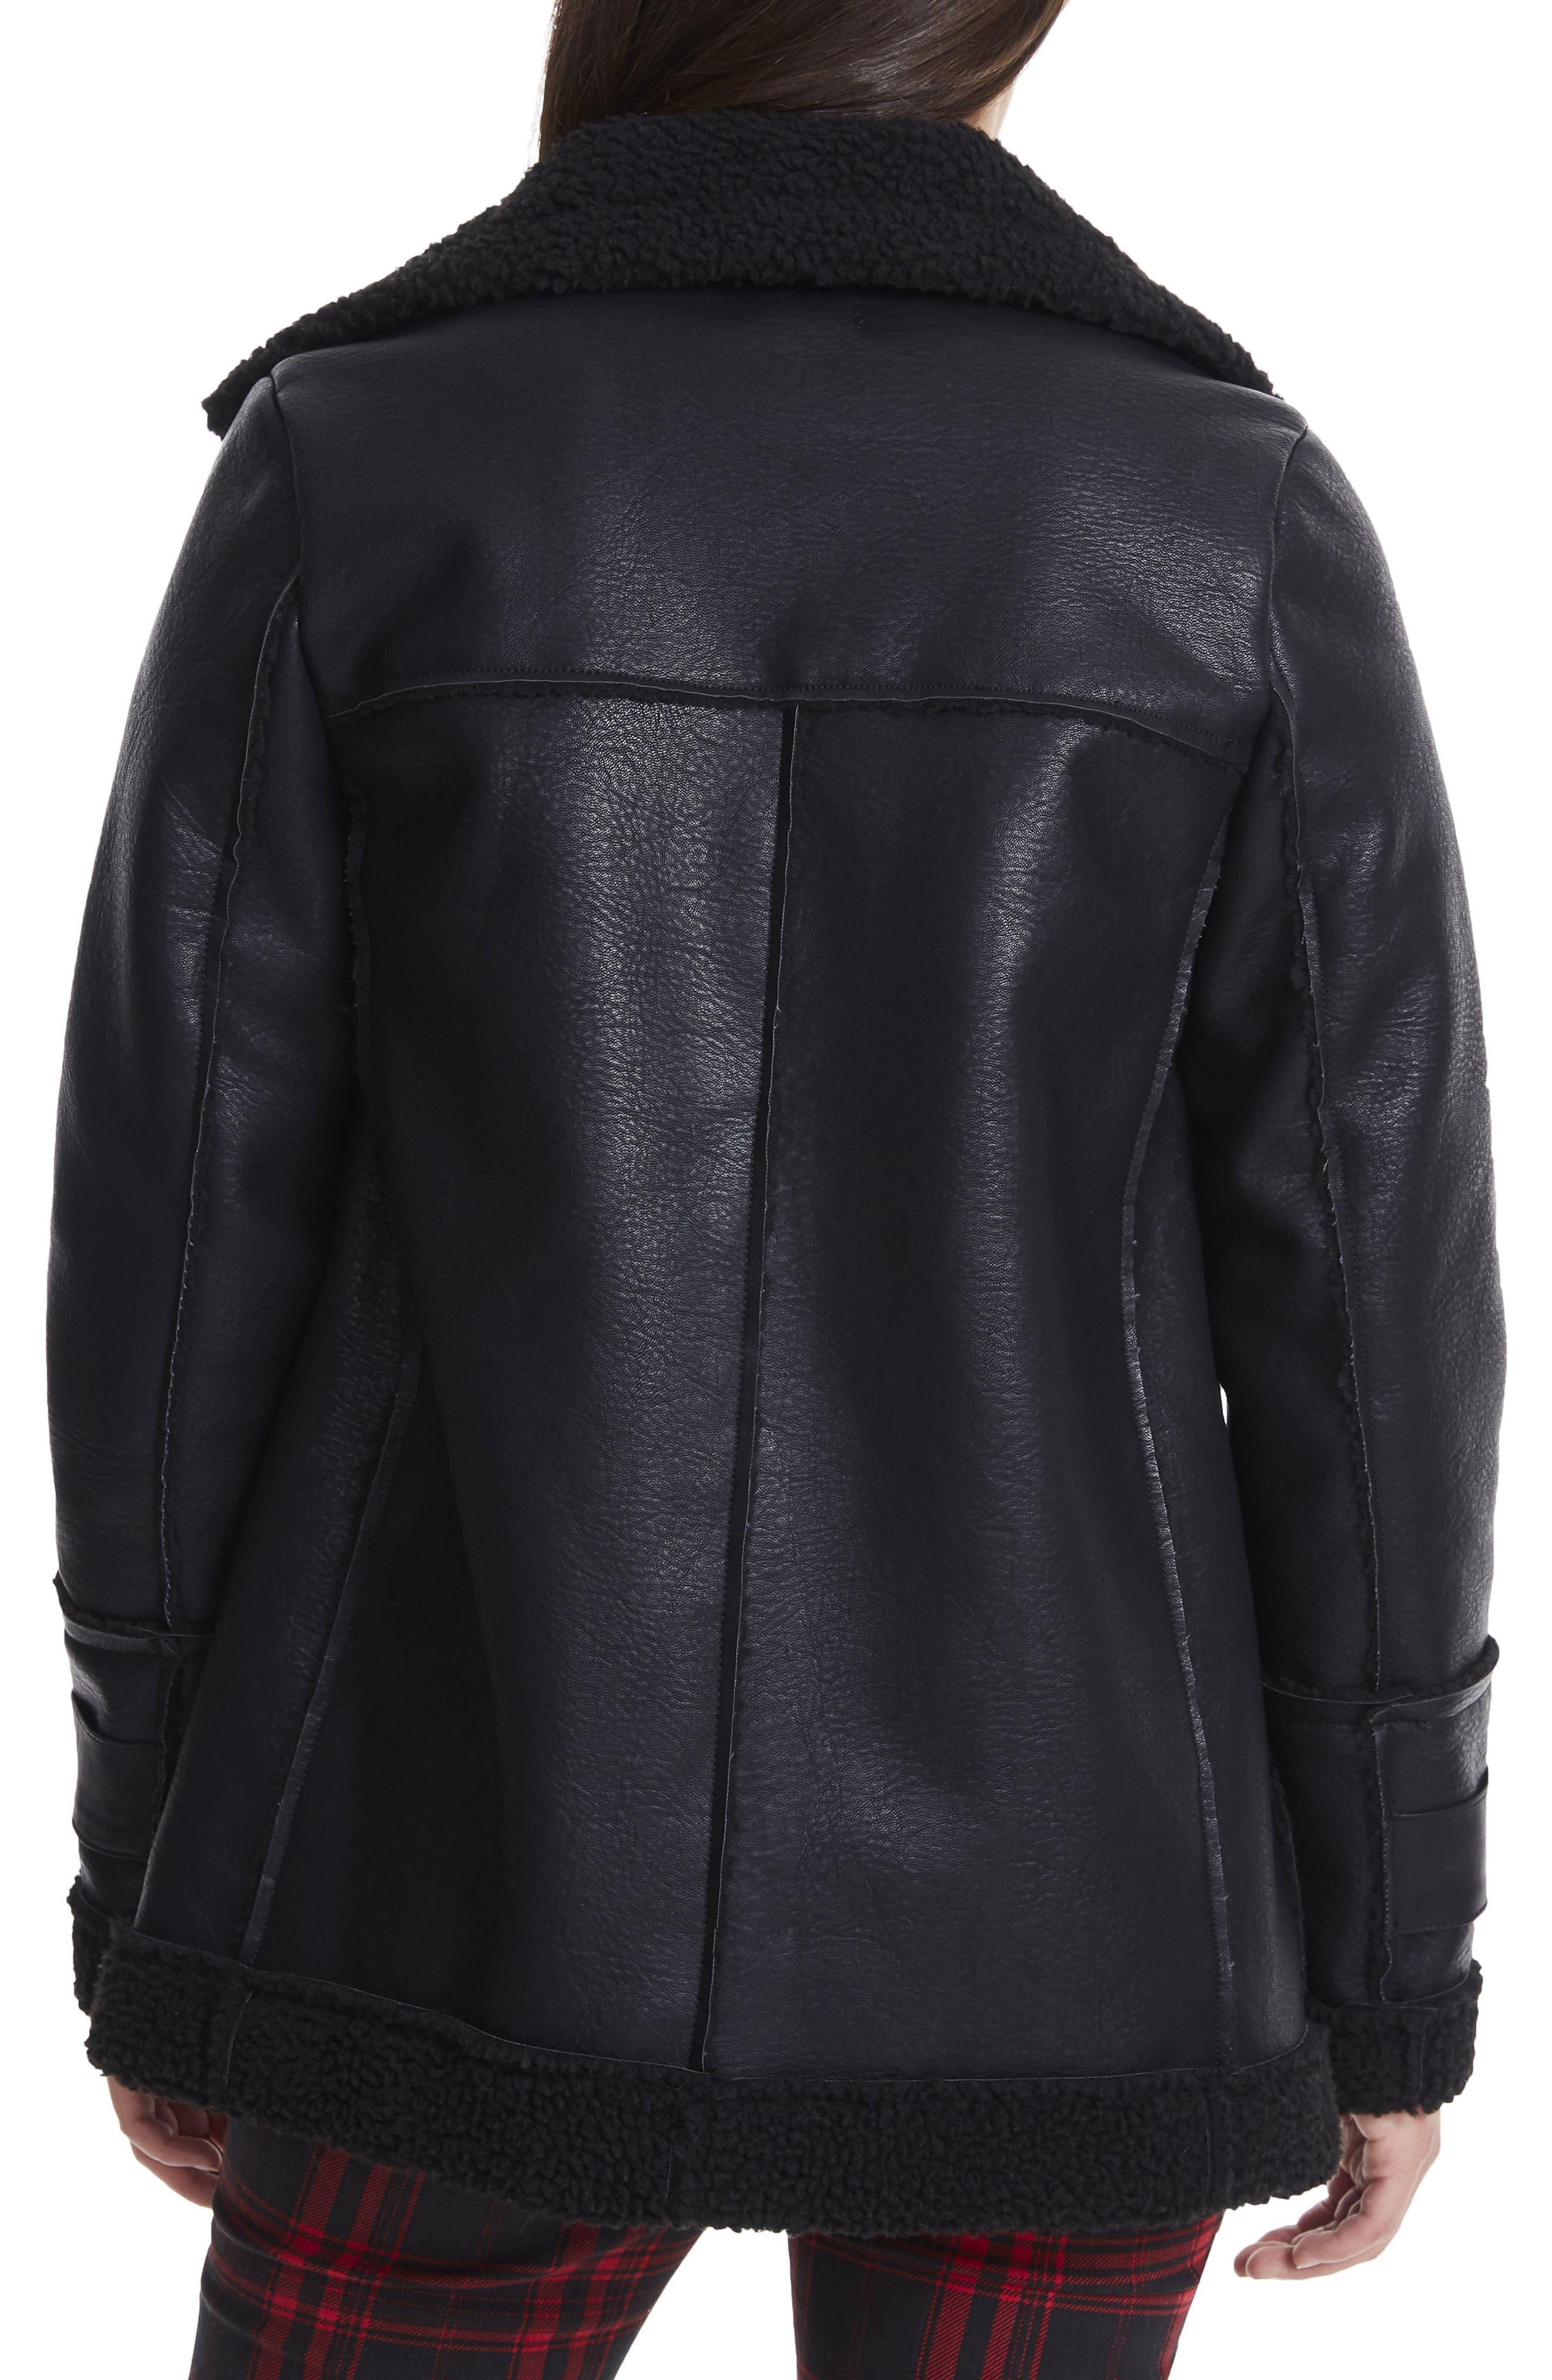 Opelia Oversize Faux Shearling Jacket,                             Alternate thumbnail 2, color,                             Noir